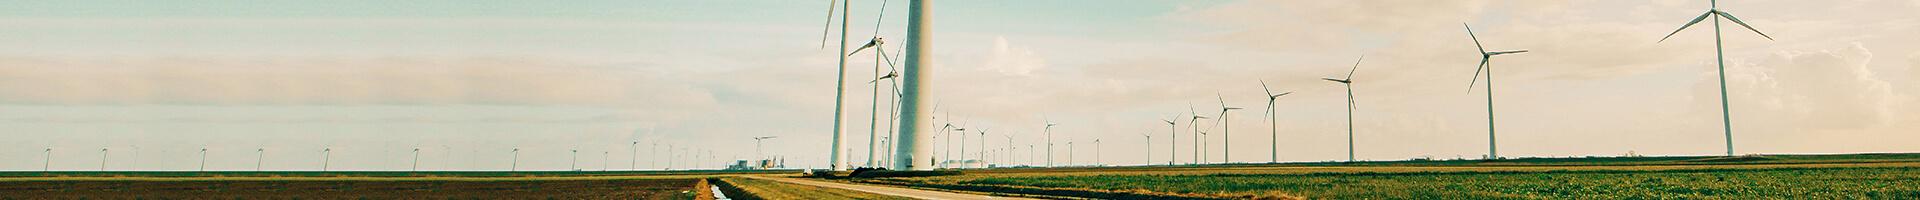 Header image - wind energy farm